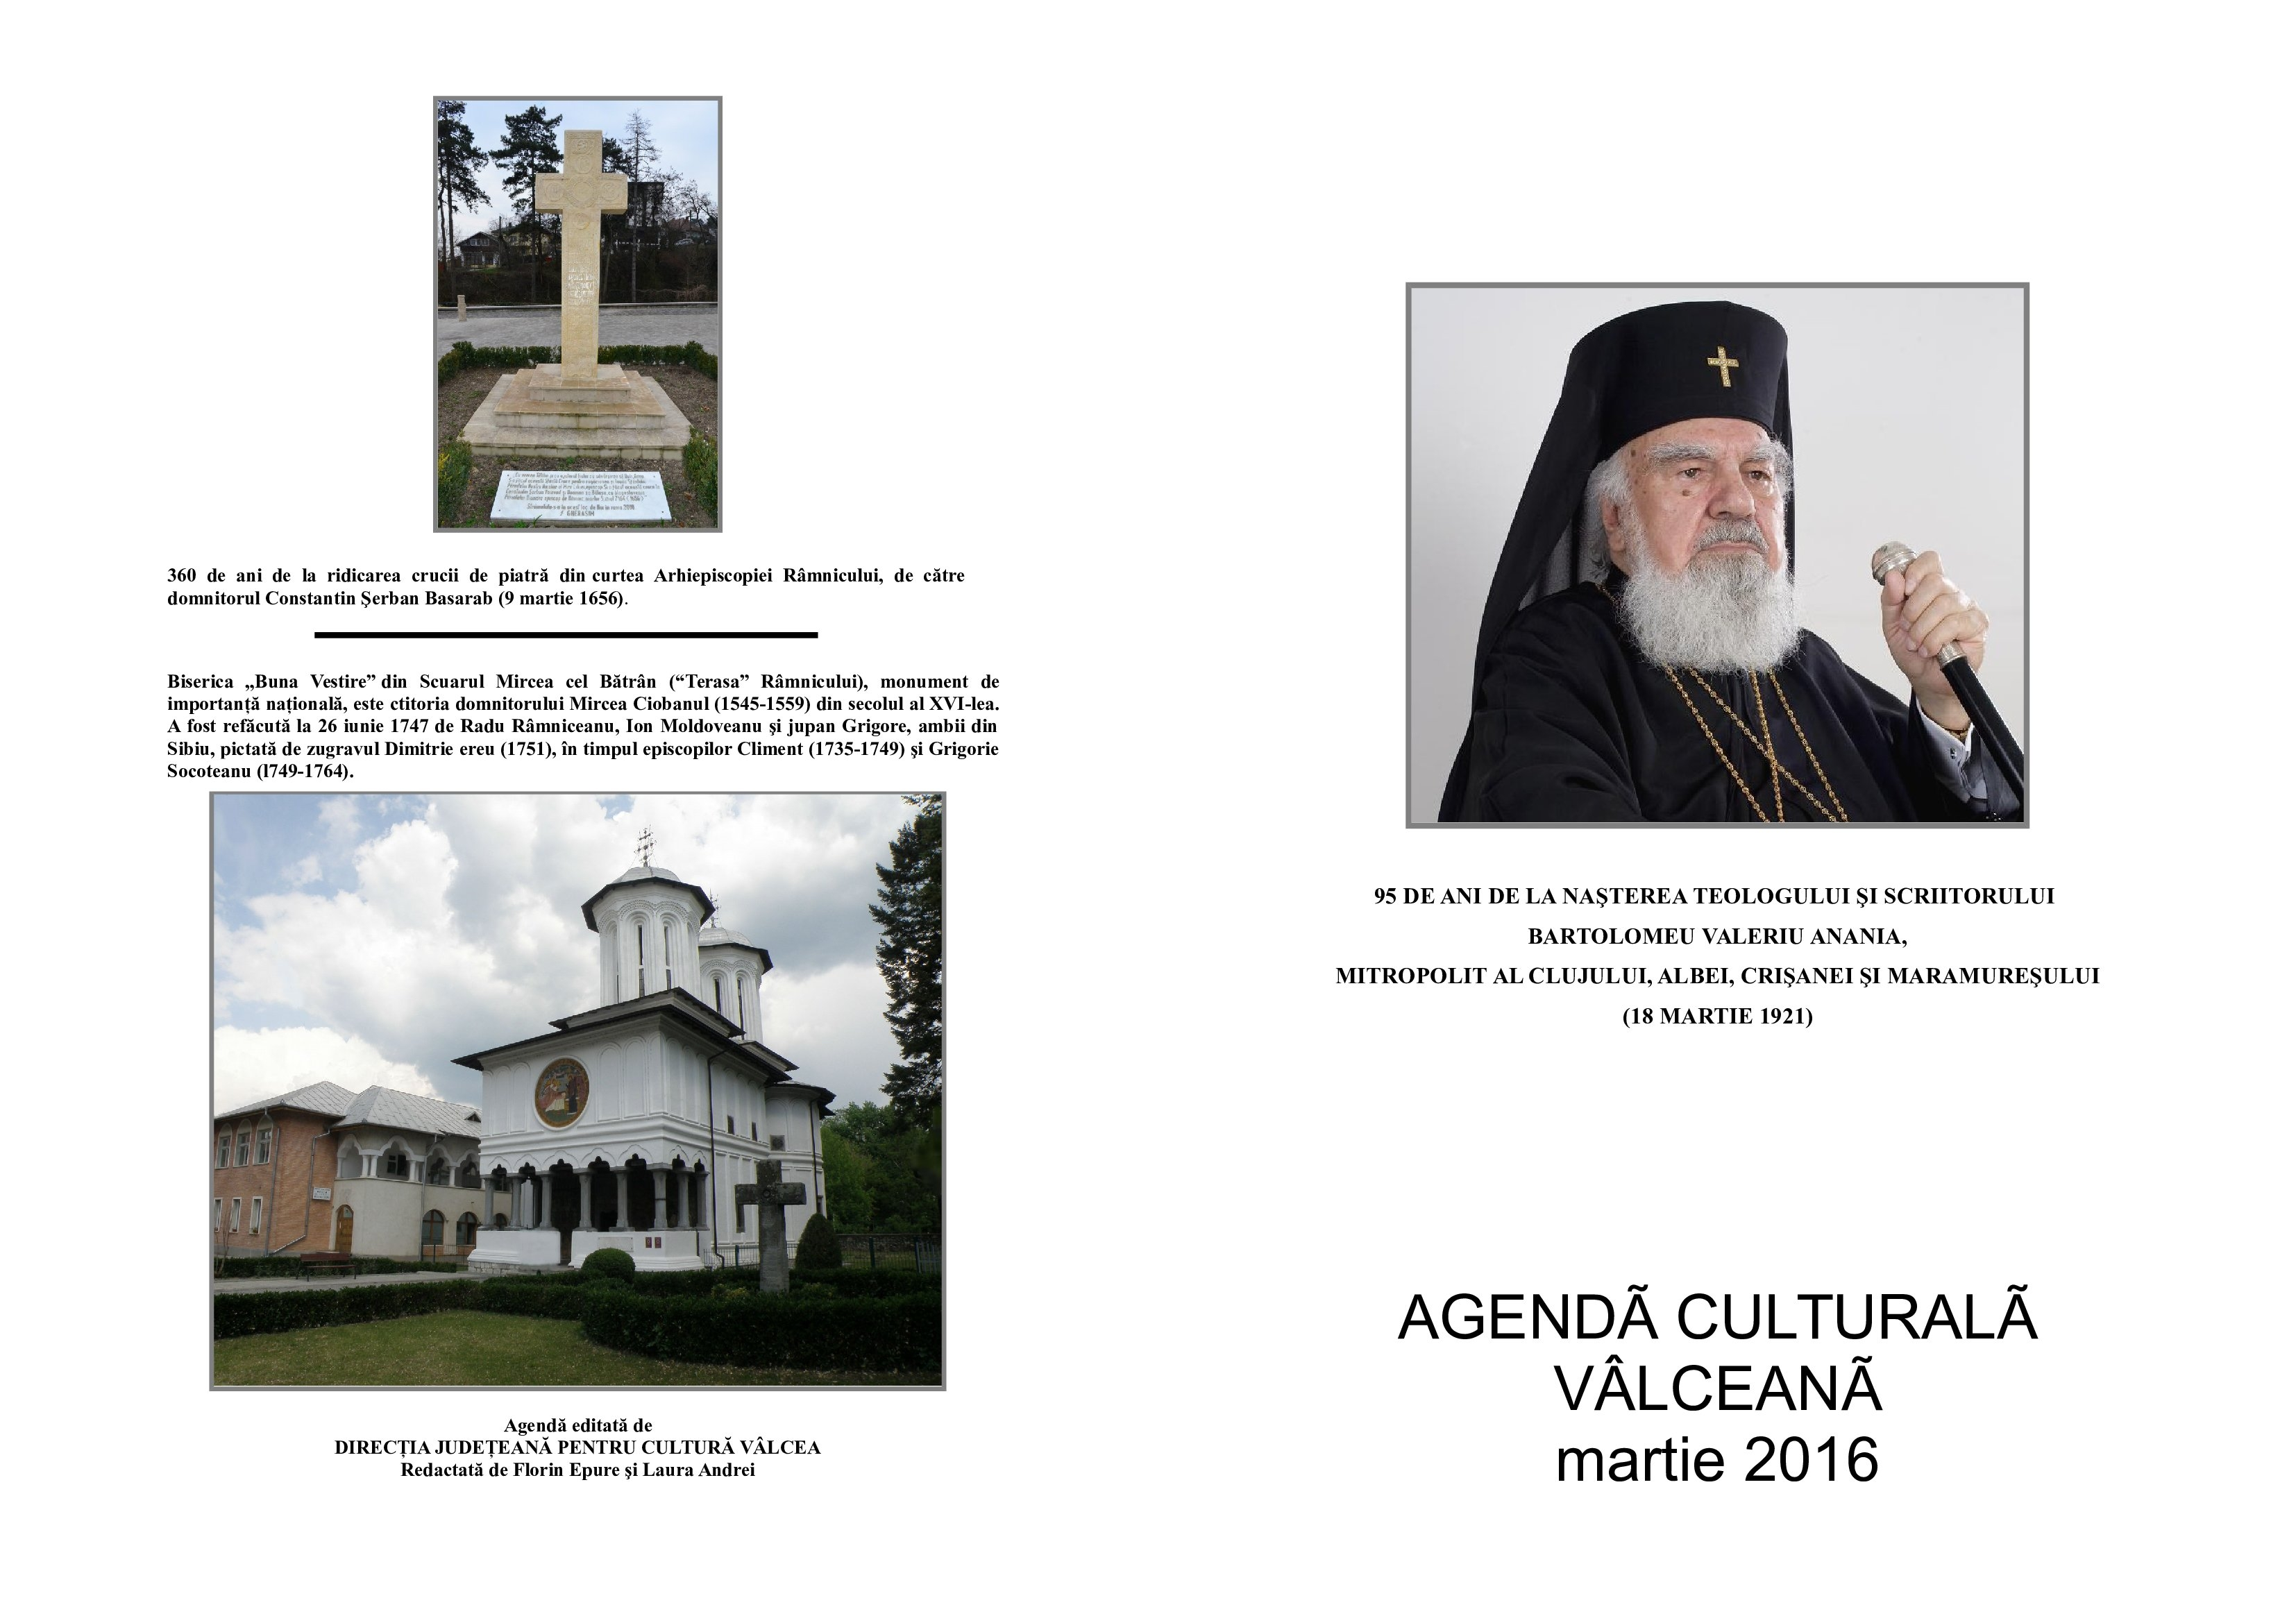 Agenda Culturala Valceana, martie 2016